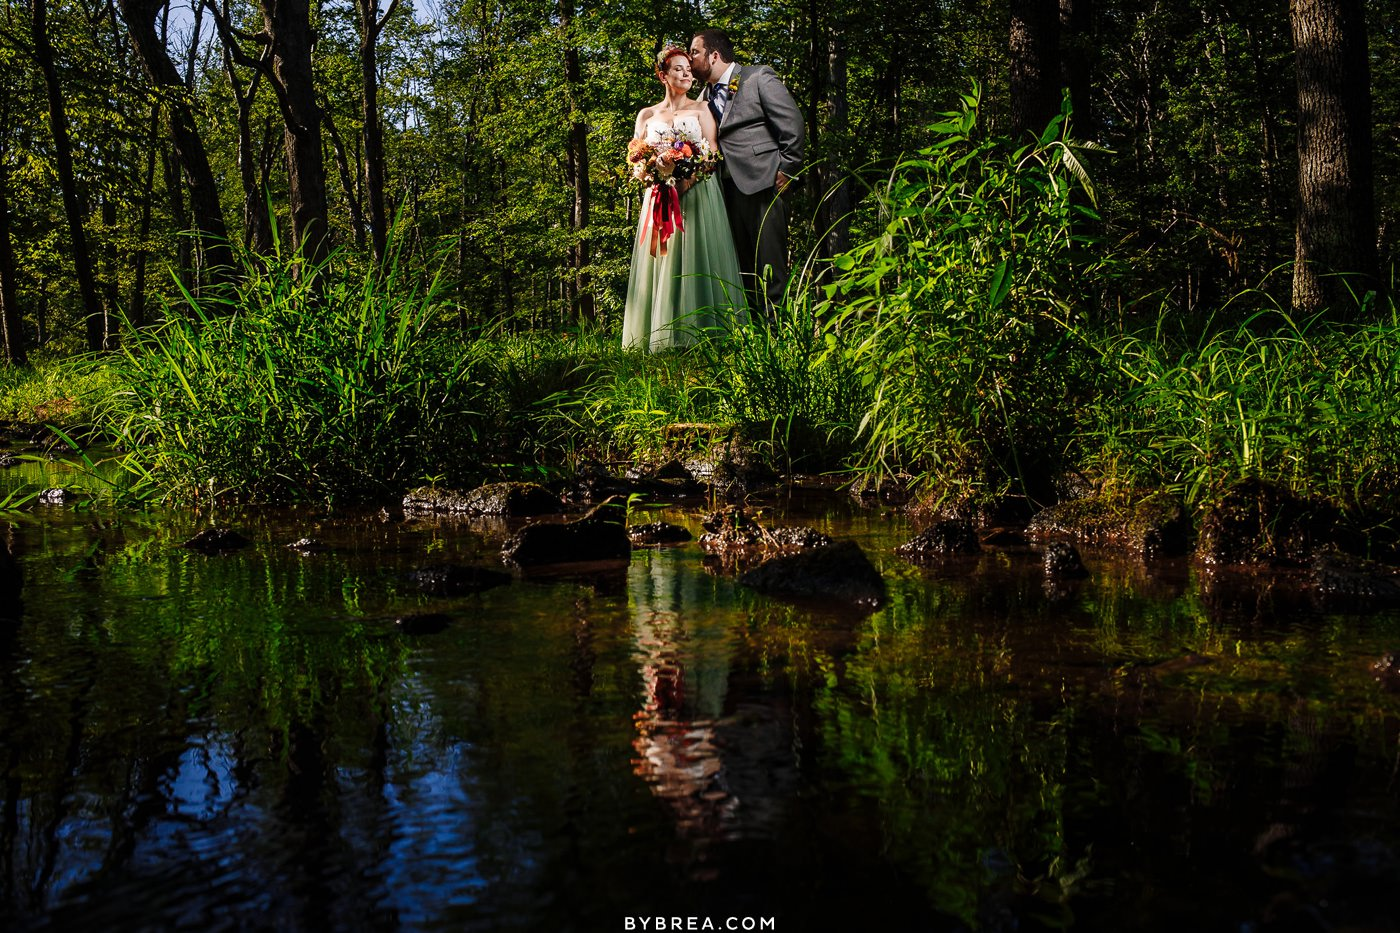 Caboose Farm Wedding photo near creek